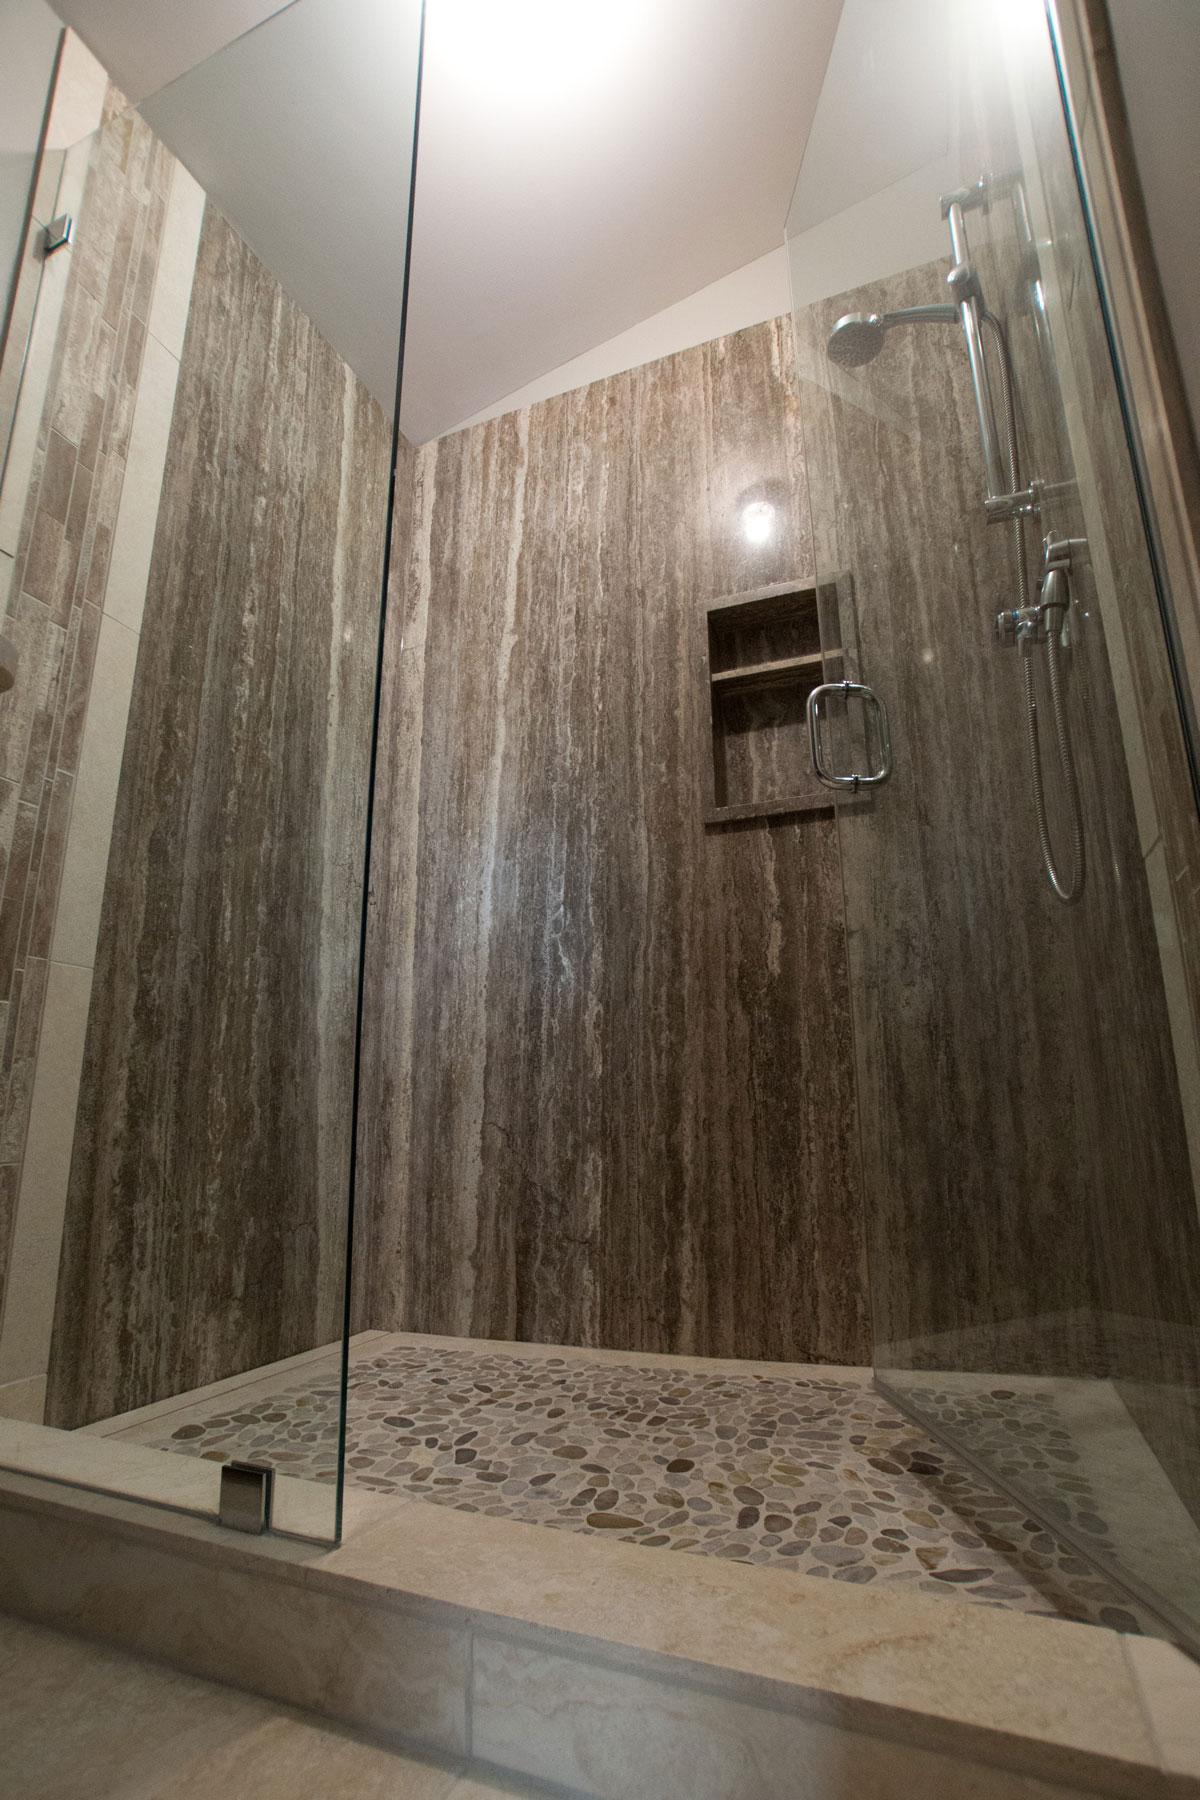 Persian Silver Bolder Panel, Cosme Travertine Random Strip, Baja White Travertine and Kootenay Pebbles Mosaic install in a shower